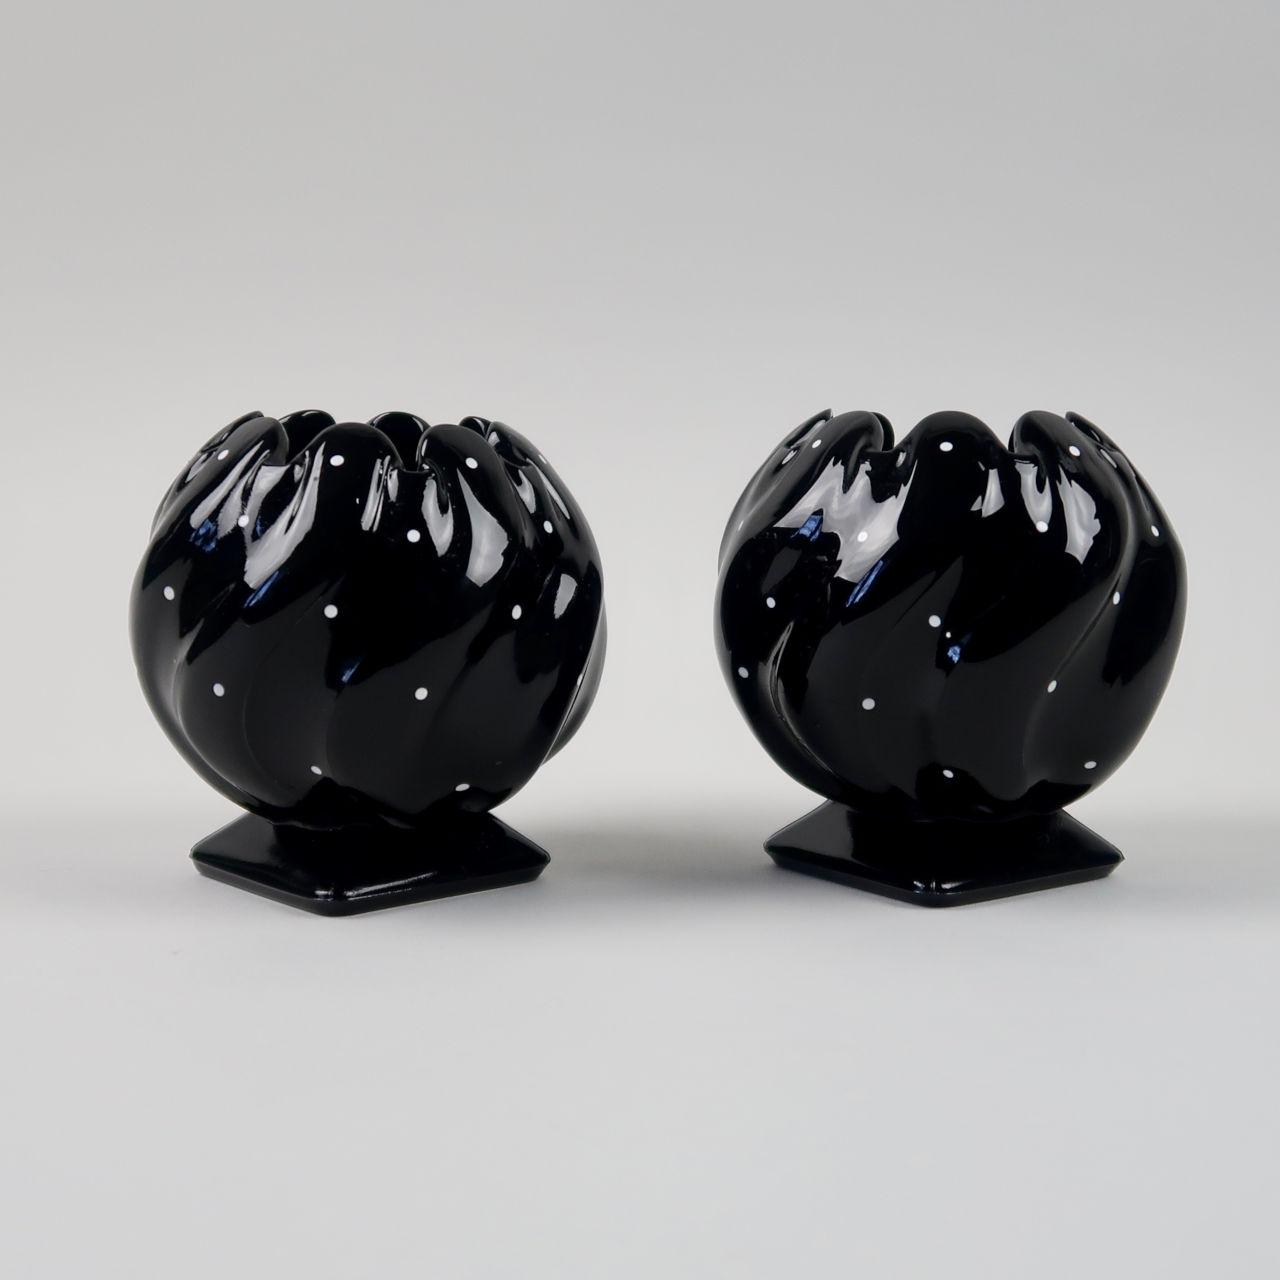 Pair of Bagley Polka Dot Glass Vases